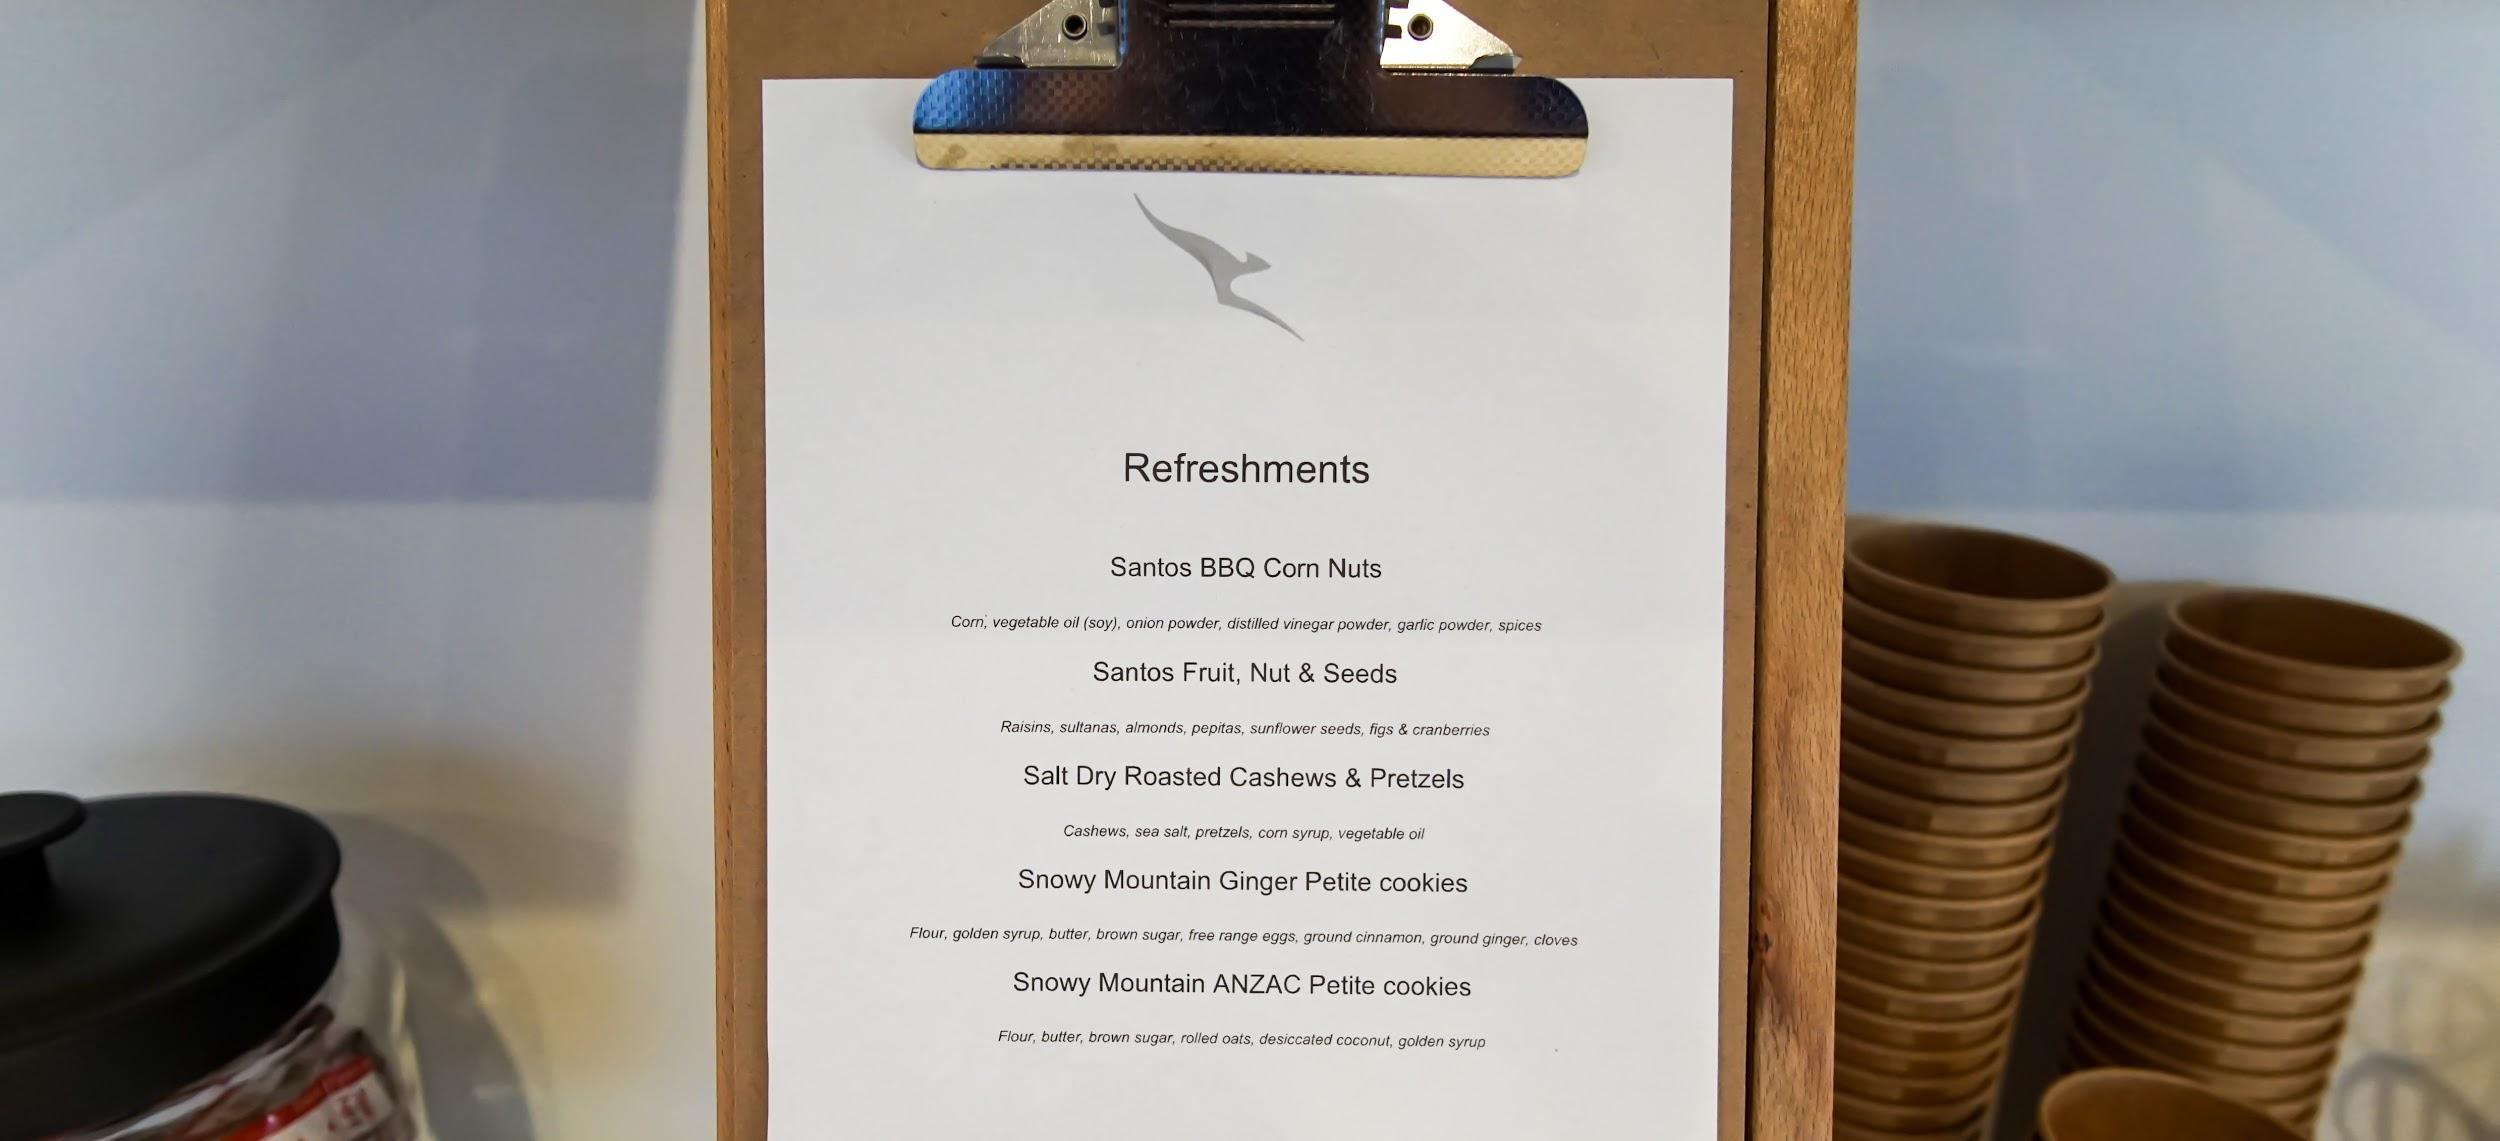 Qantas Regional Lounge Launceston refreshments